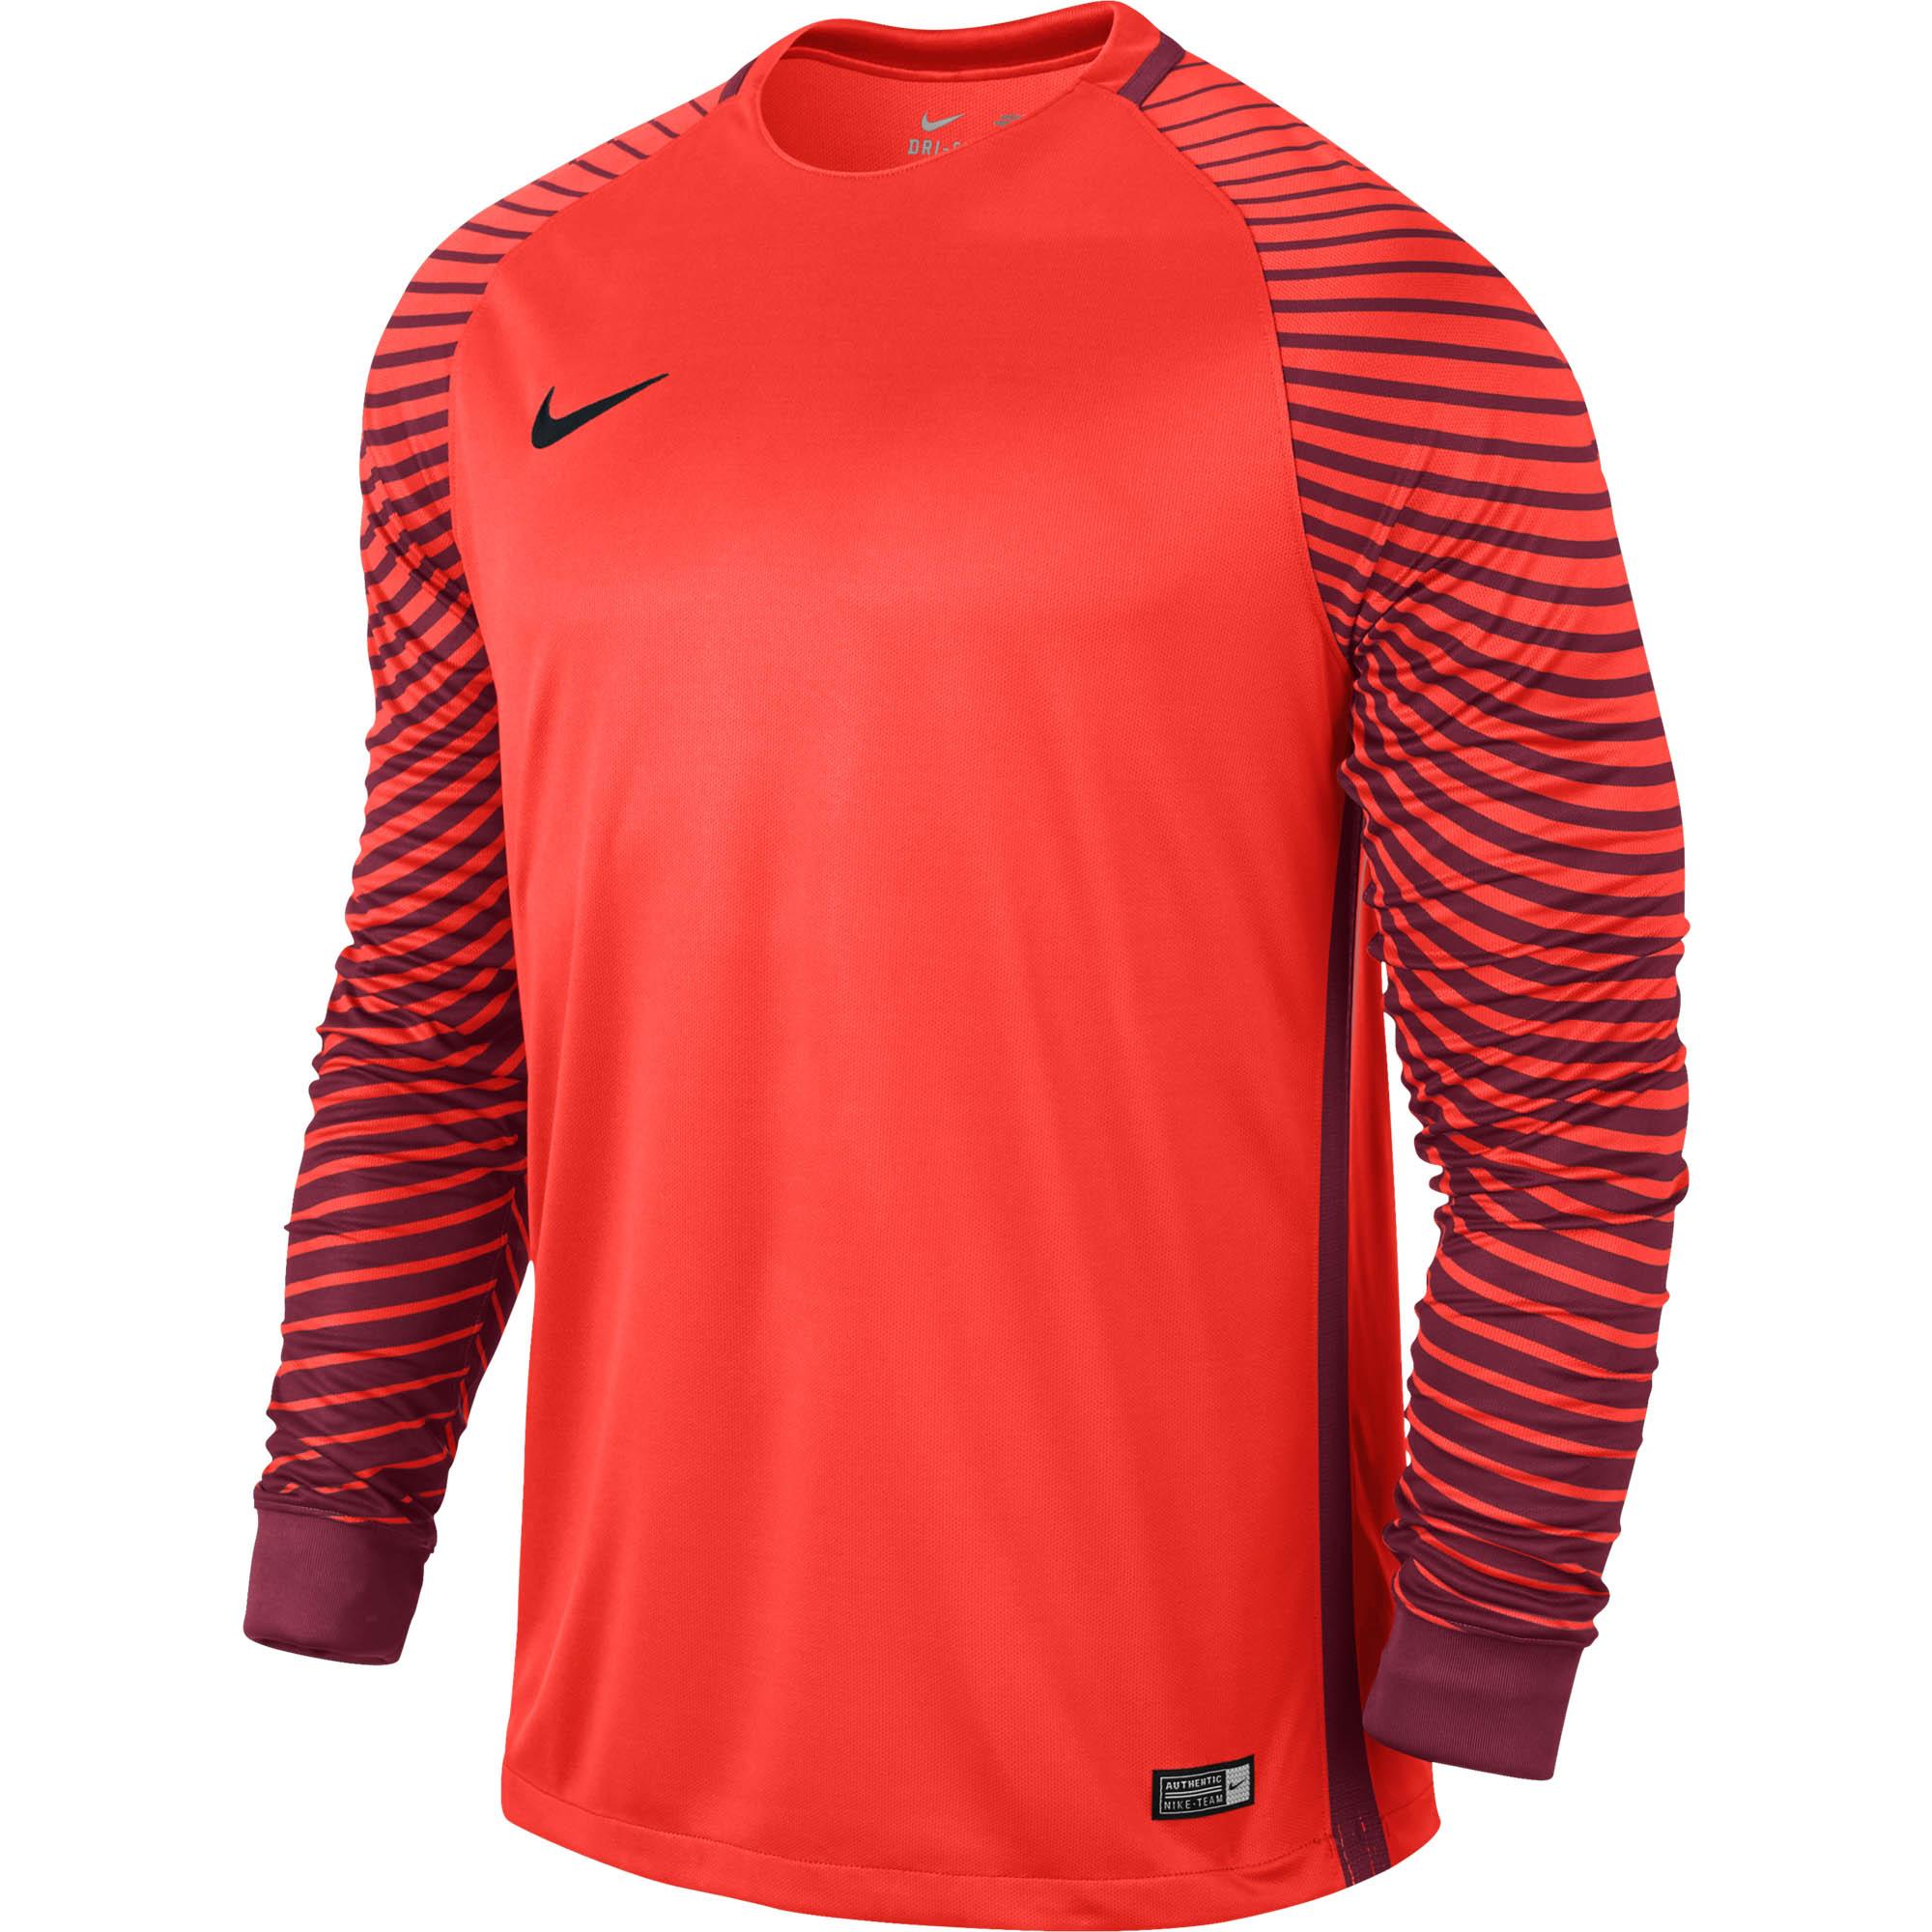 627160e023e Nike Gardien Goalie Jersey - Bright Crimson Goalkeeper Jersey